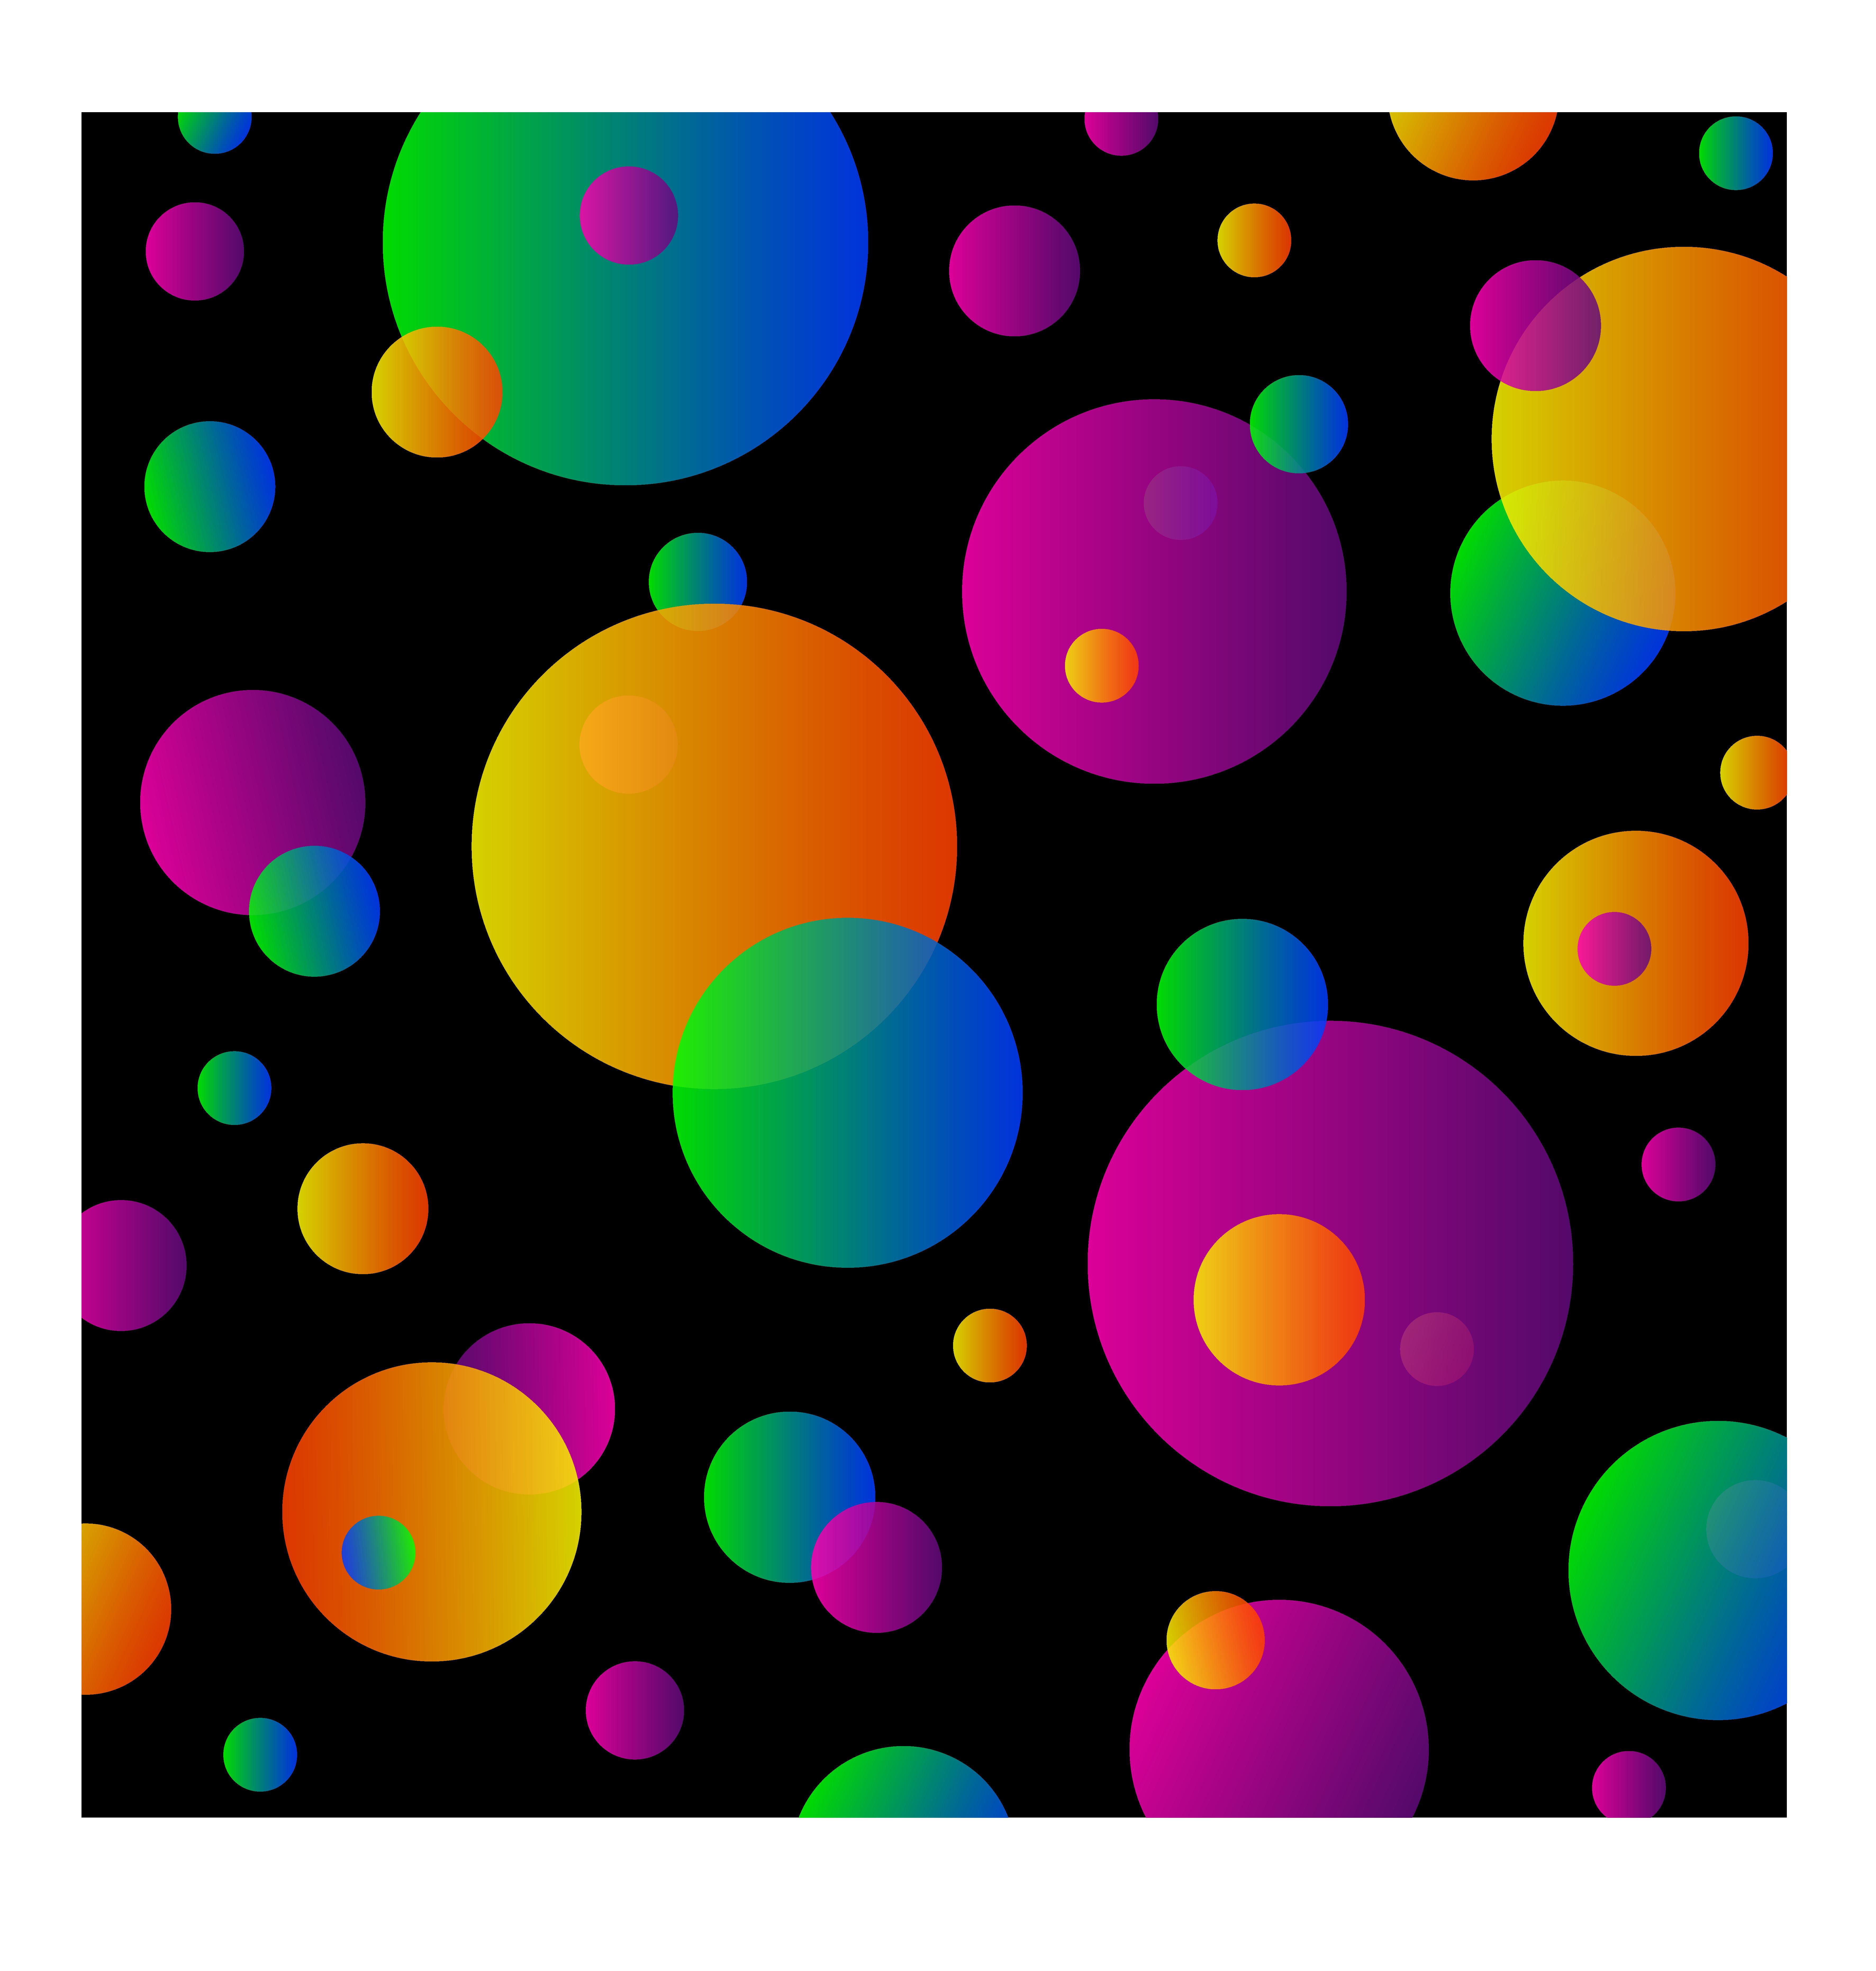 Colorful Circles Pattern on Black.